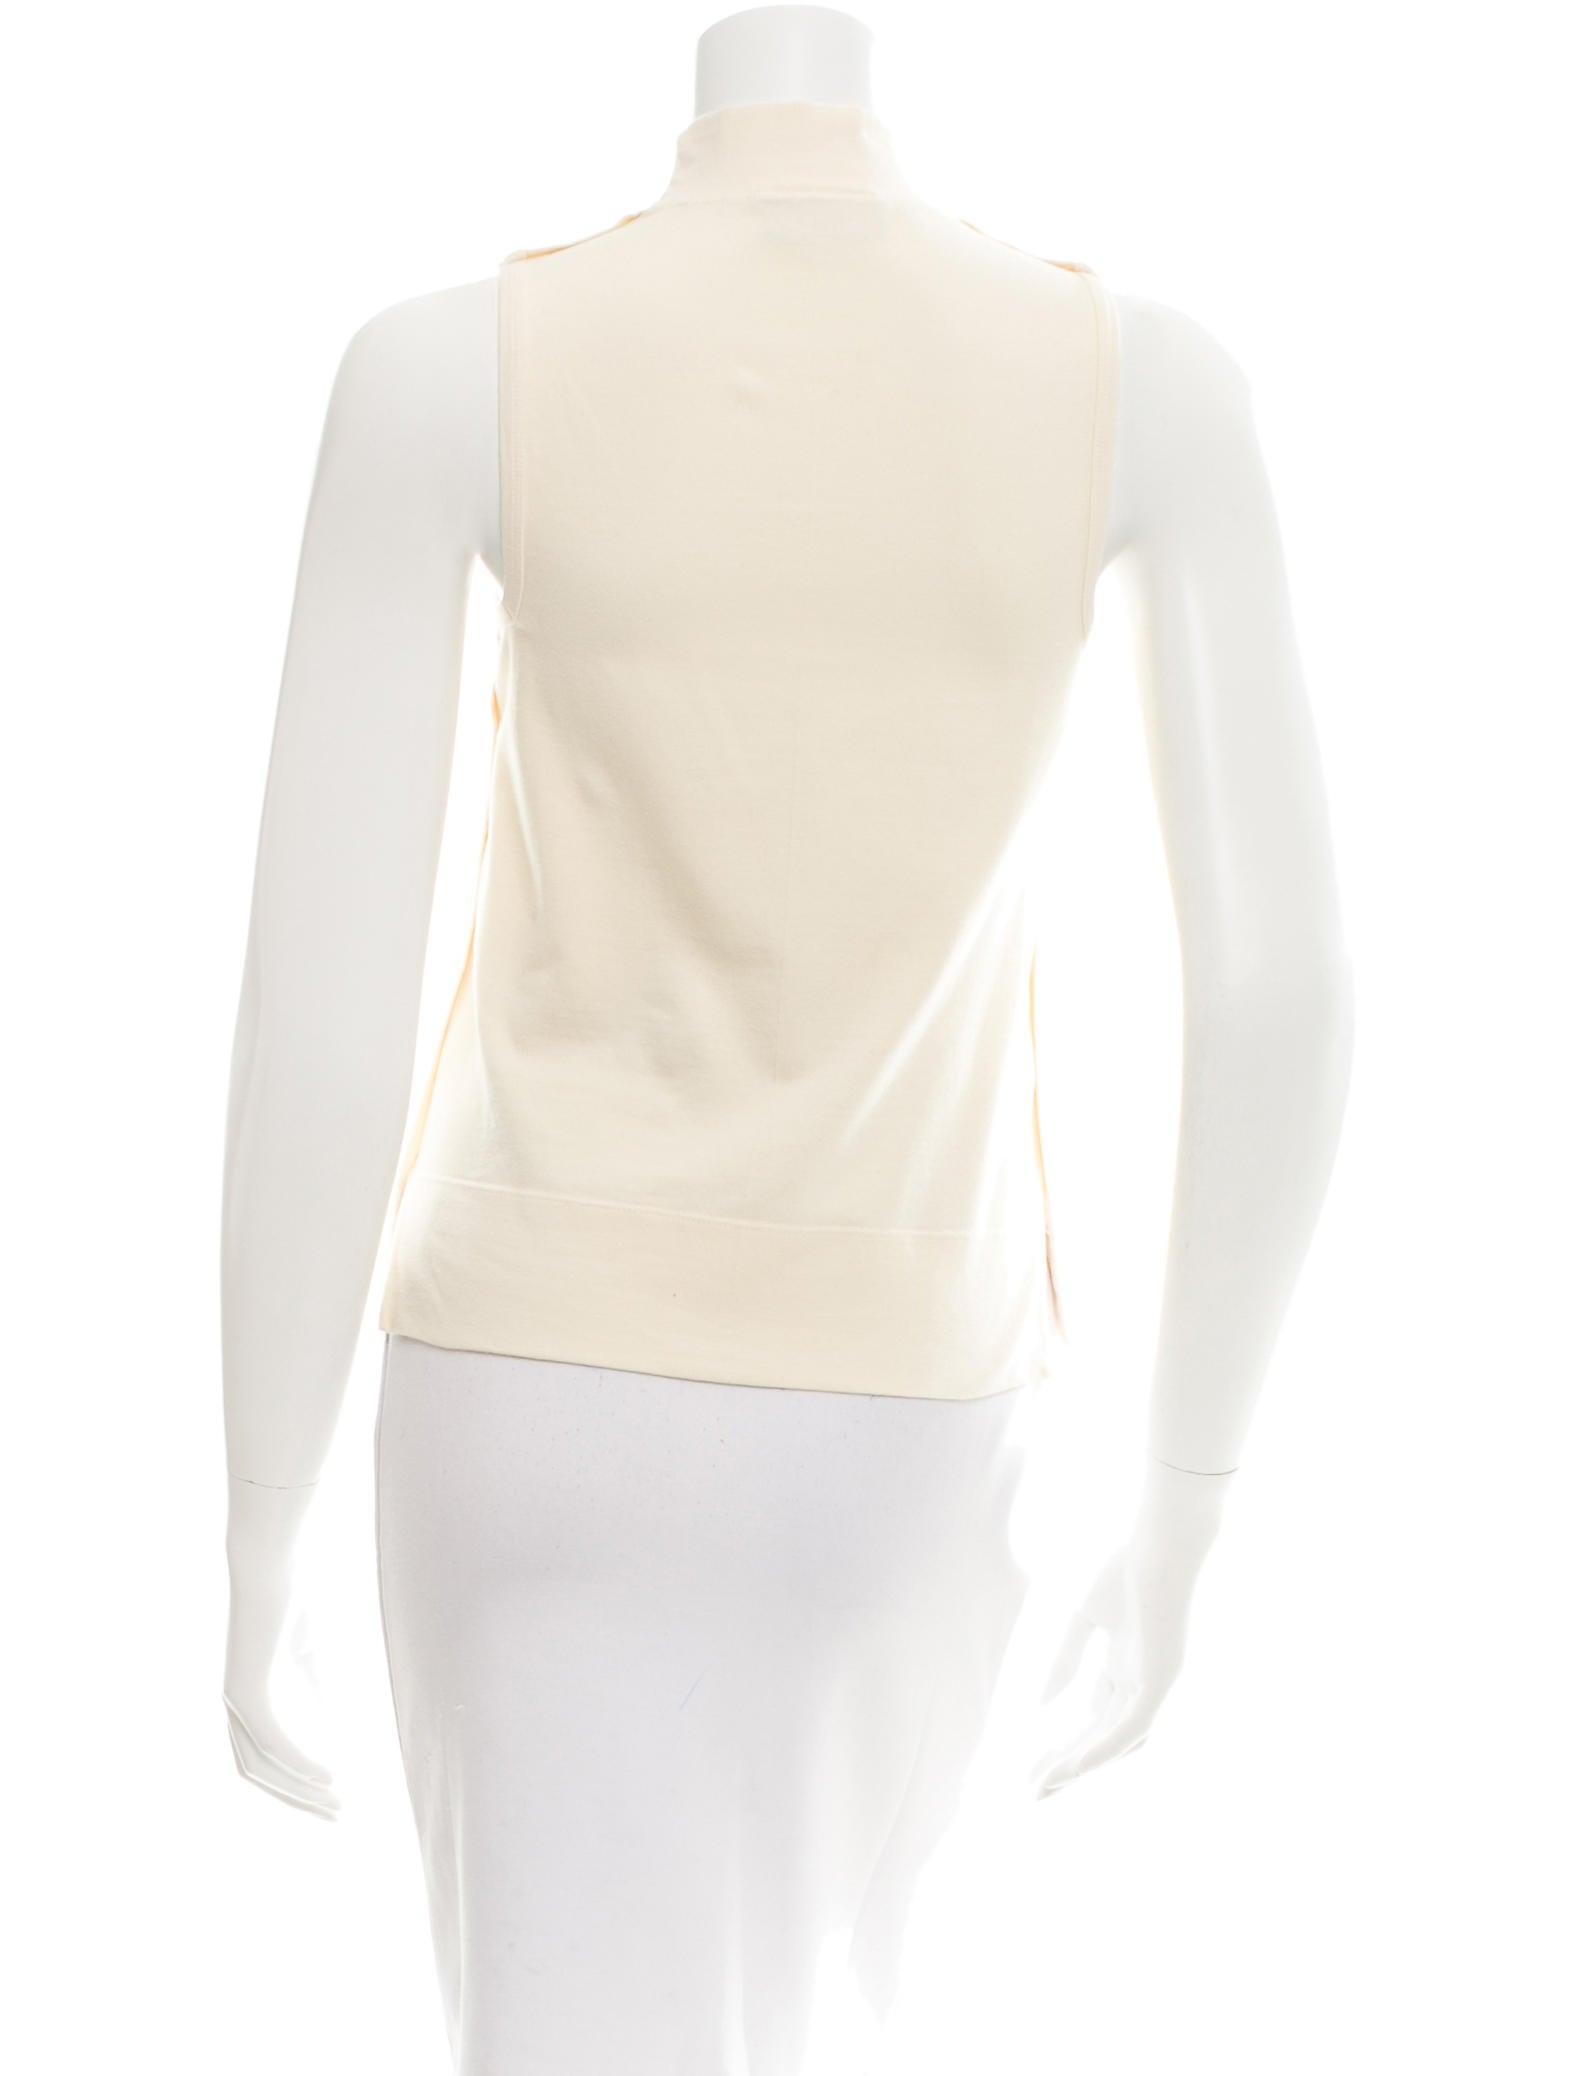 Fendi Sleeveless Mock Neck Top Clothing Fen47555 The